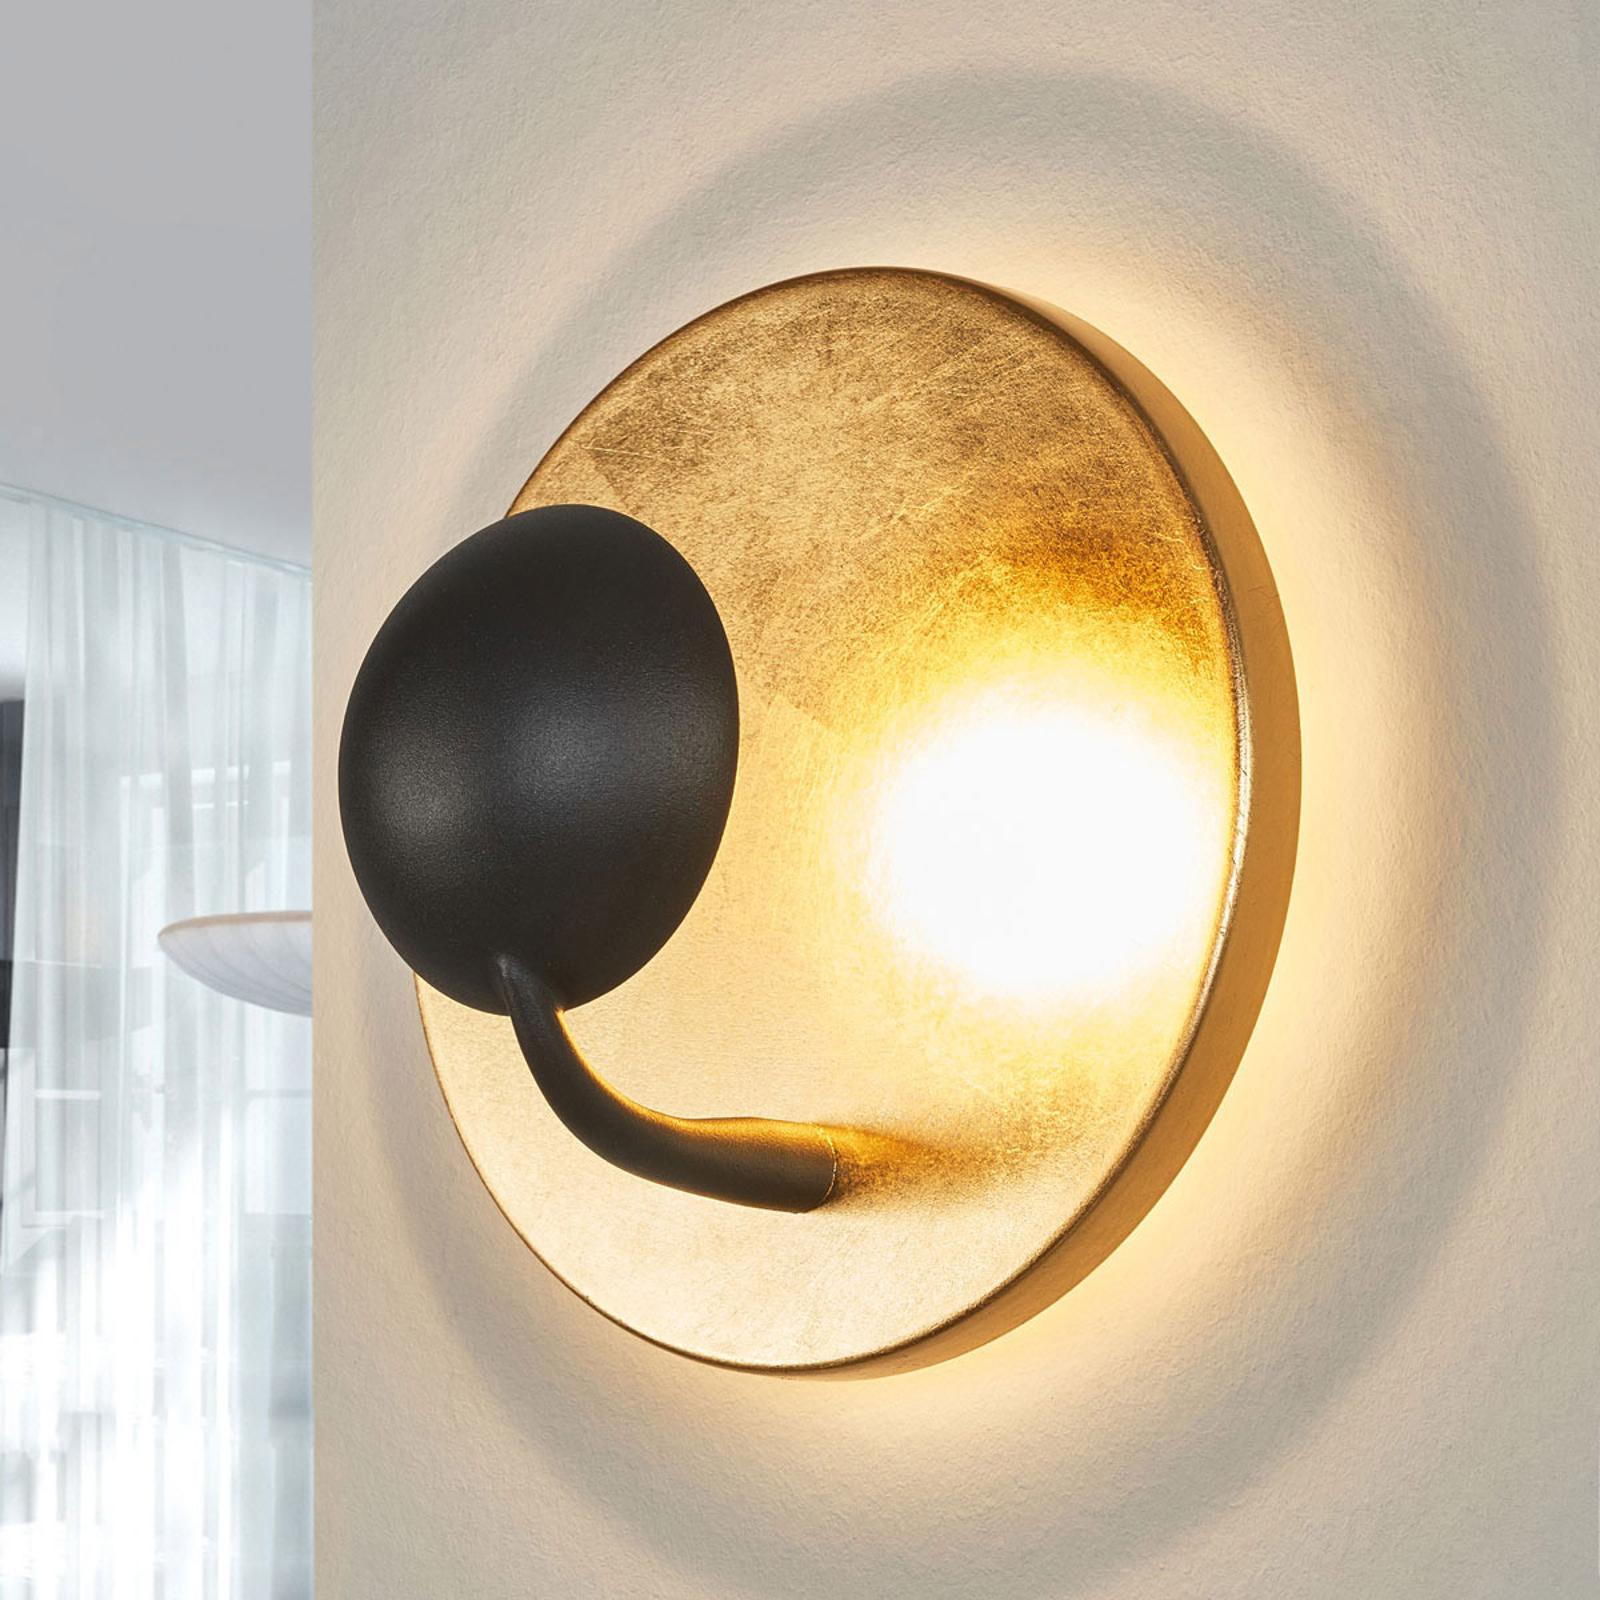 LED-Wandlampe Aurora schwarz-gold